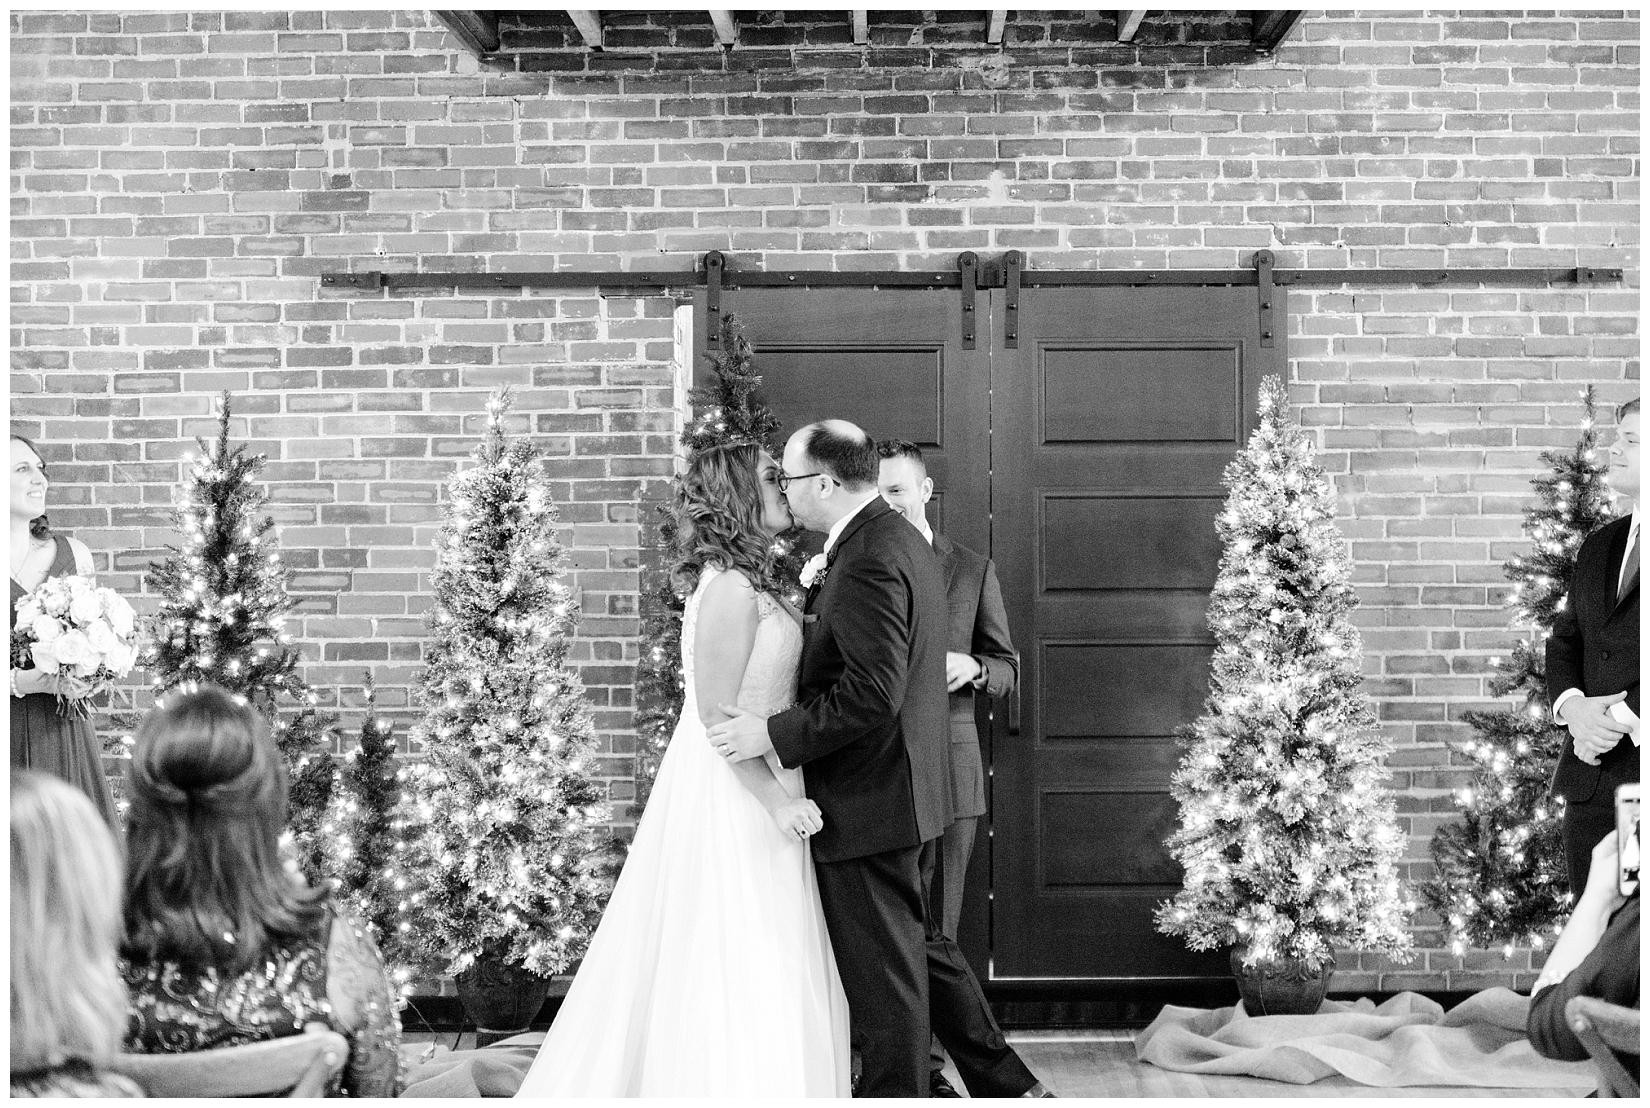 cat-alkire-wedding-photographer-indiana-chicago-indianapolis-fort-wayne_0951.jpg